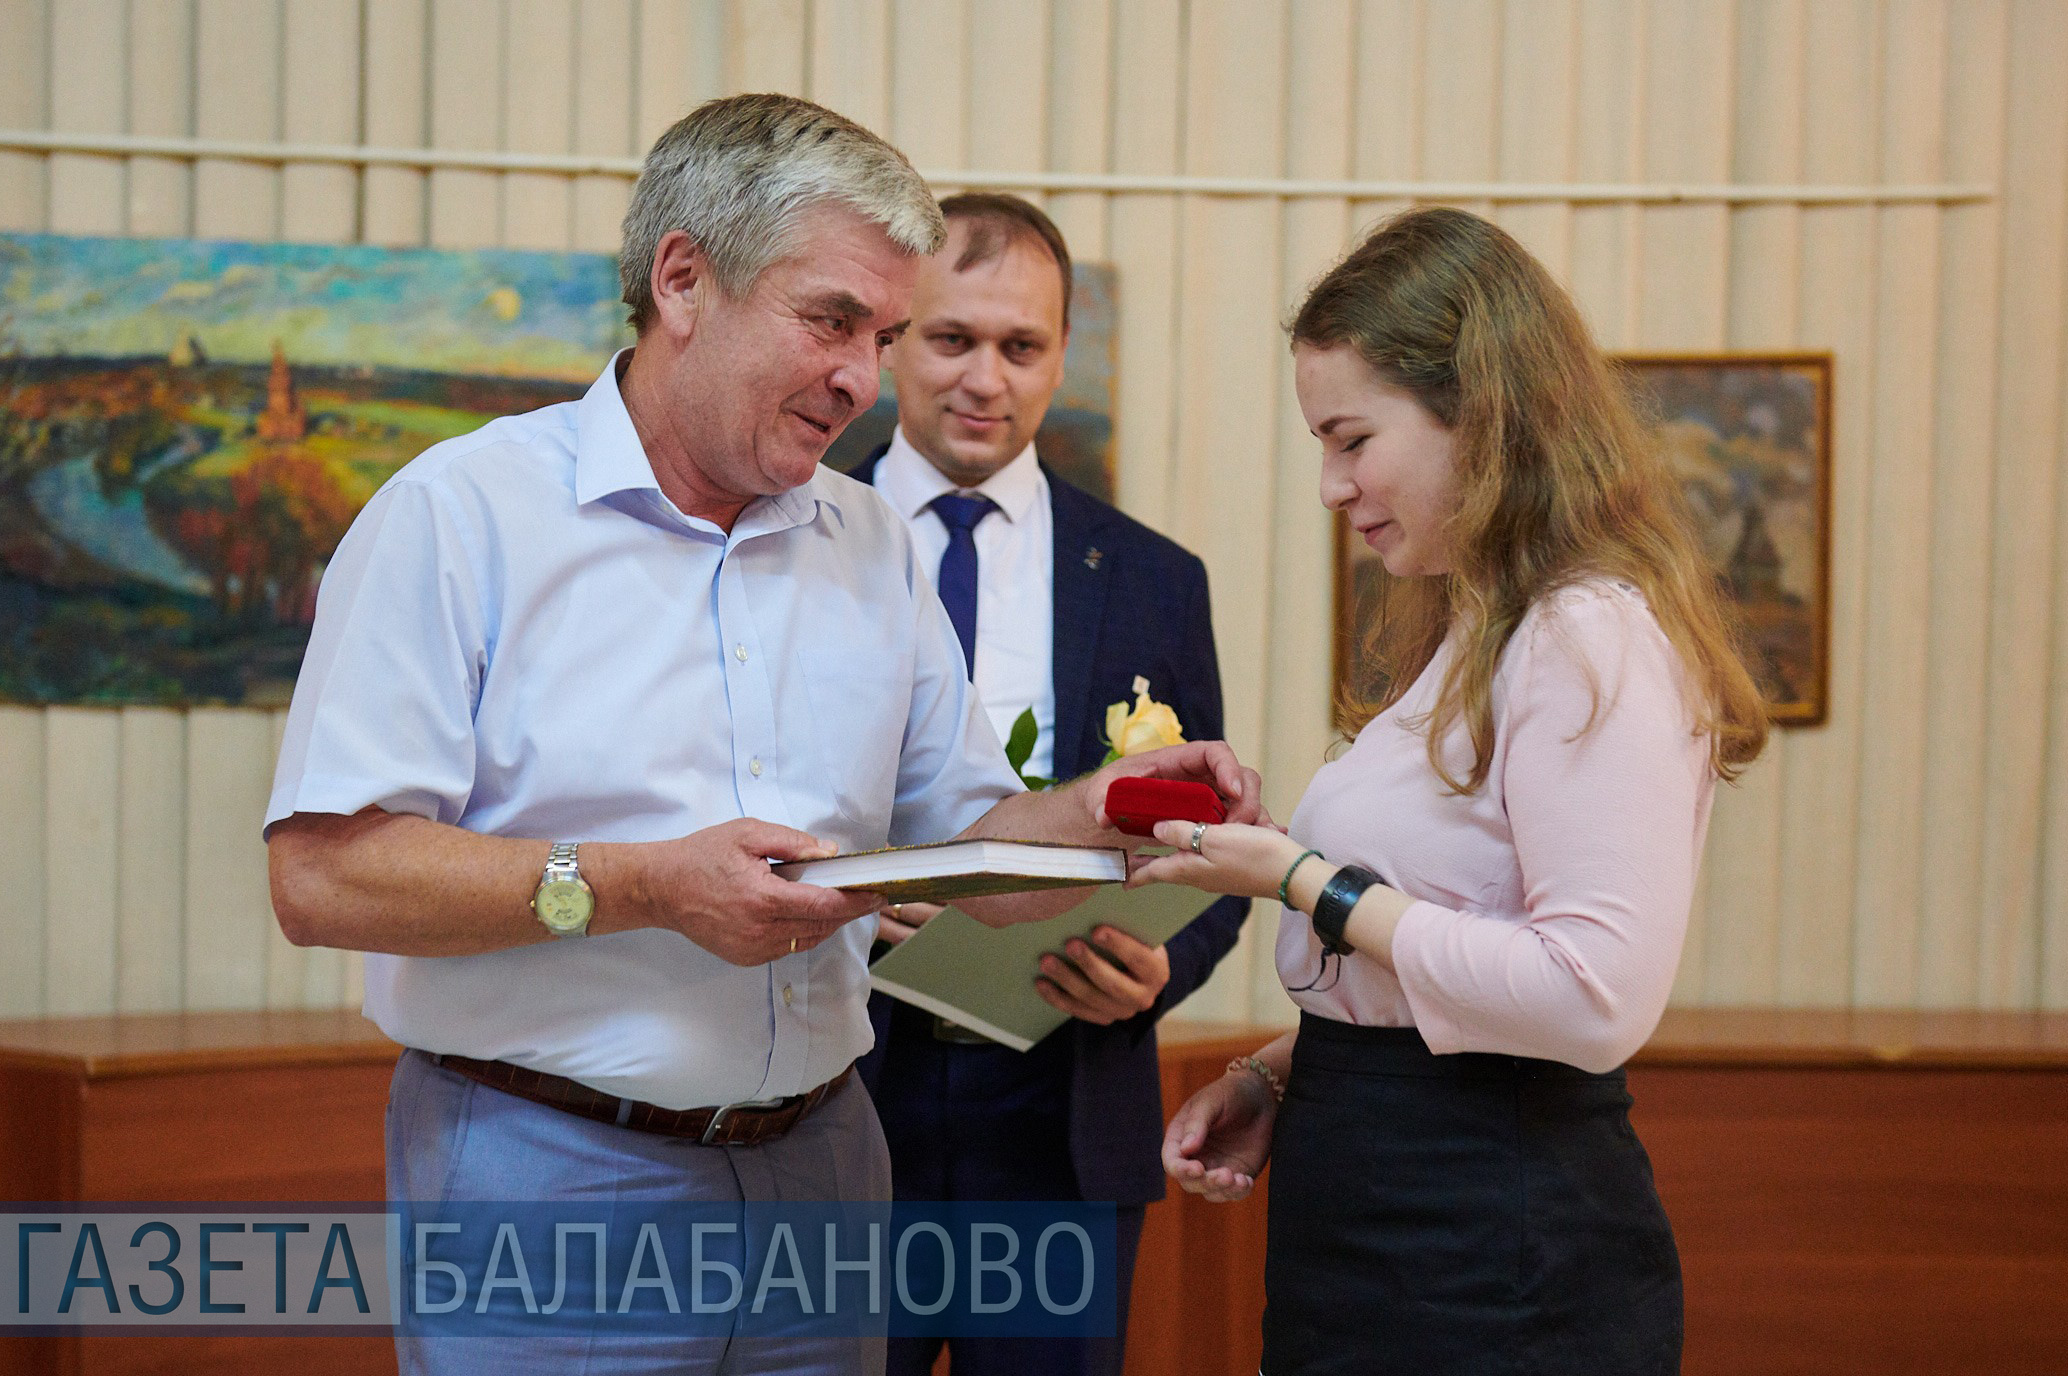 Медалистов наградили